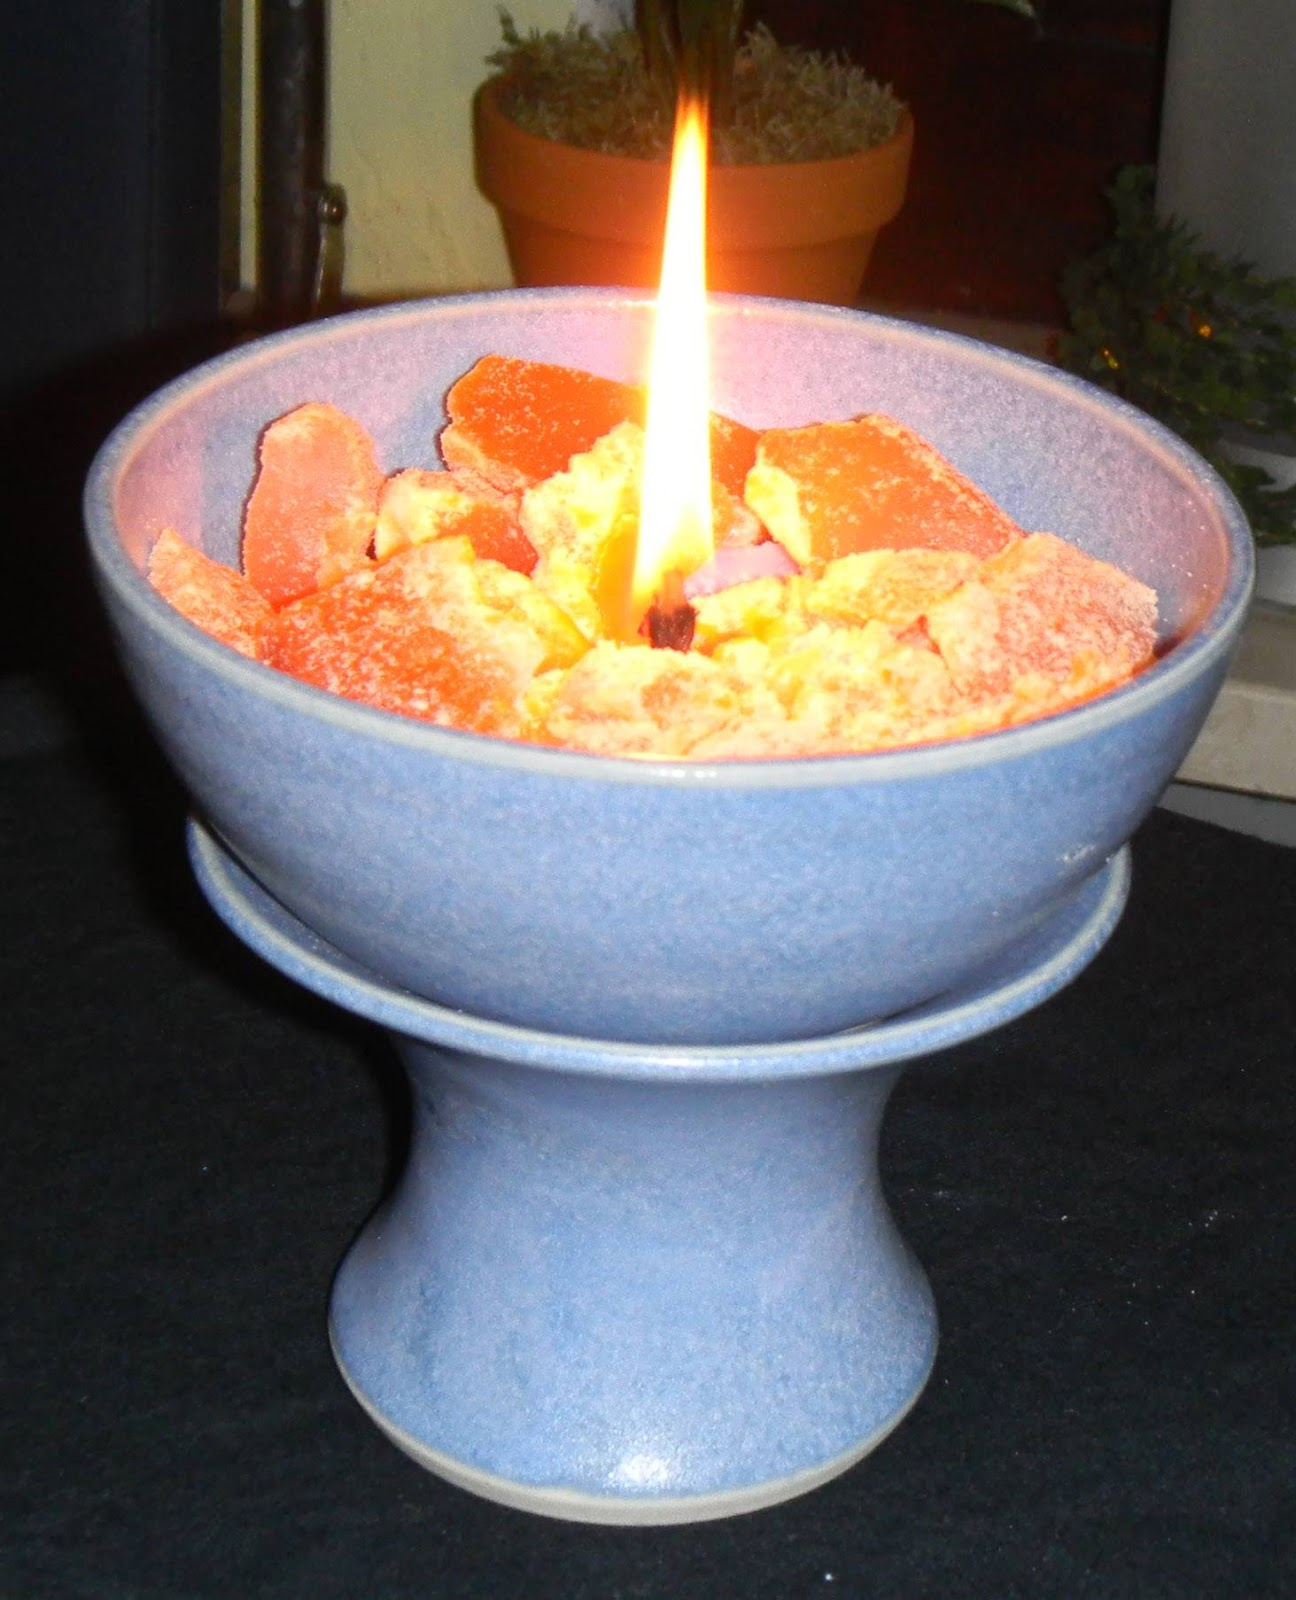 life and stuff die duftlampe yankee candle co die. Black Bedroom Furniture Sets. Home Design Ideas